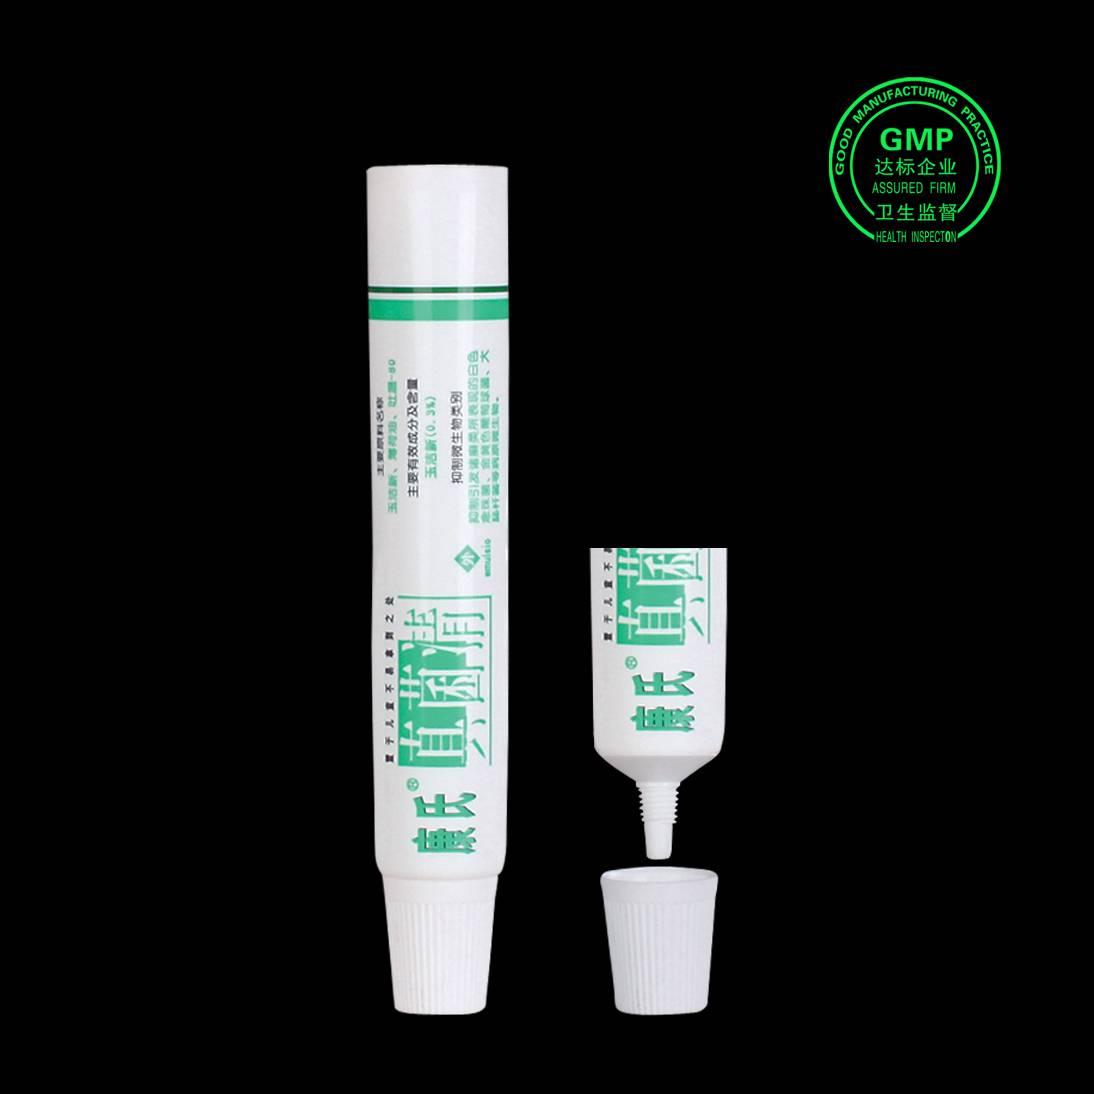 AT D22mm Plastic tube for pharmaceuticals